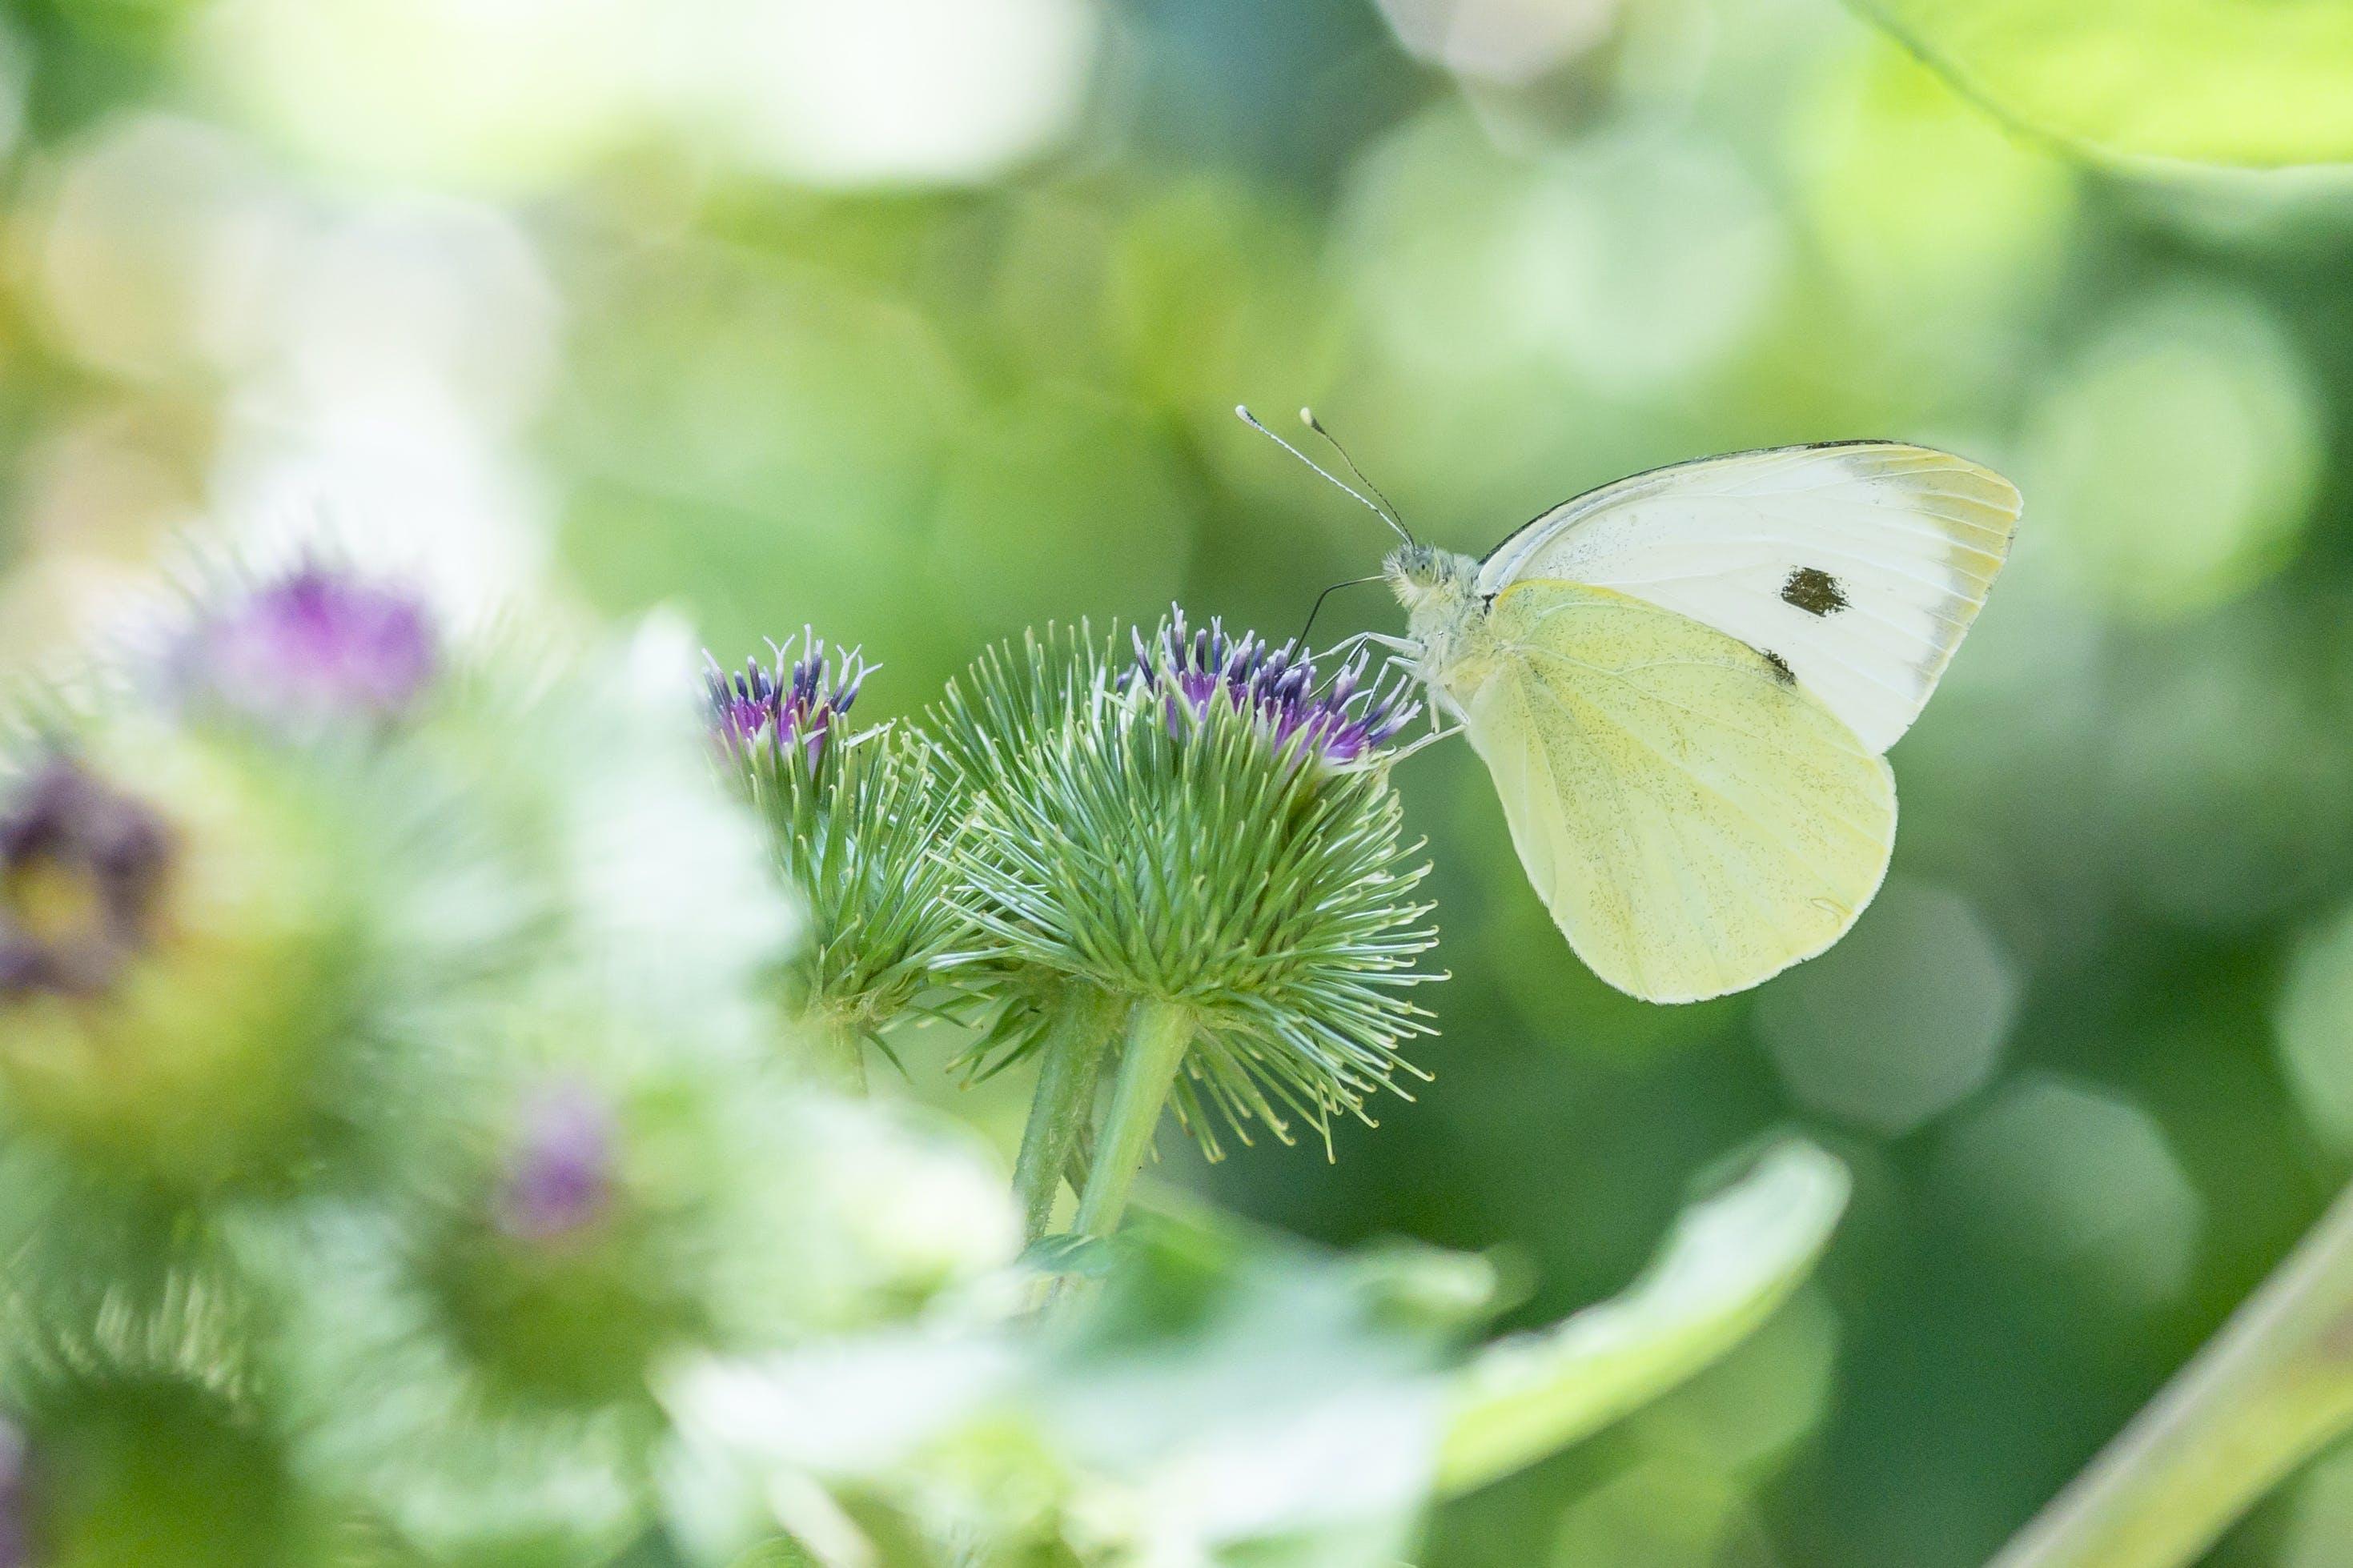 Kostnadsfri bild av biologi, blomma, delikat, djur